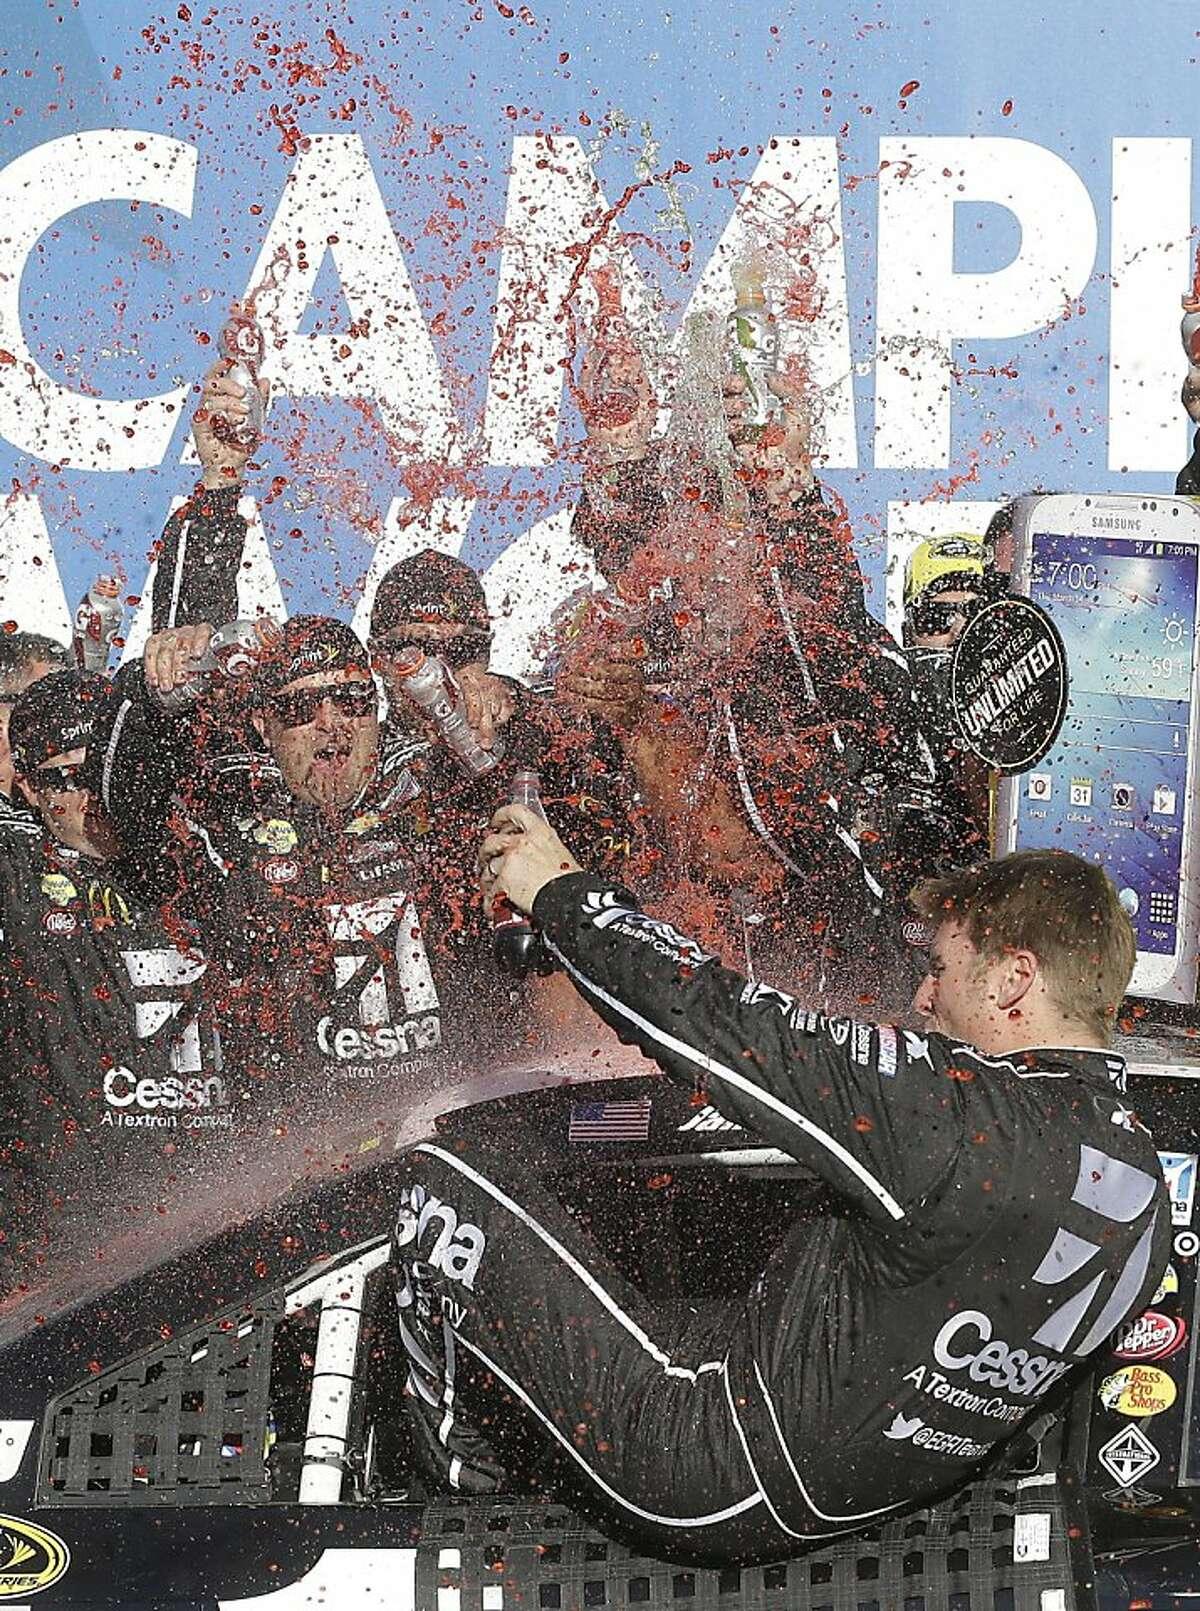 Sprint Cup Series driver Jamie McMurray (1) celebrates after winning the NASCAR Sprint Cup Series auto race at the Talladega Superspeedway in Talladega, Ala., Sunday, Oct. 20, 2013.(AP Photo/Jay Sailors)